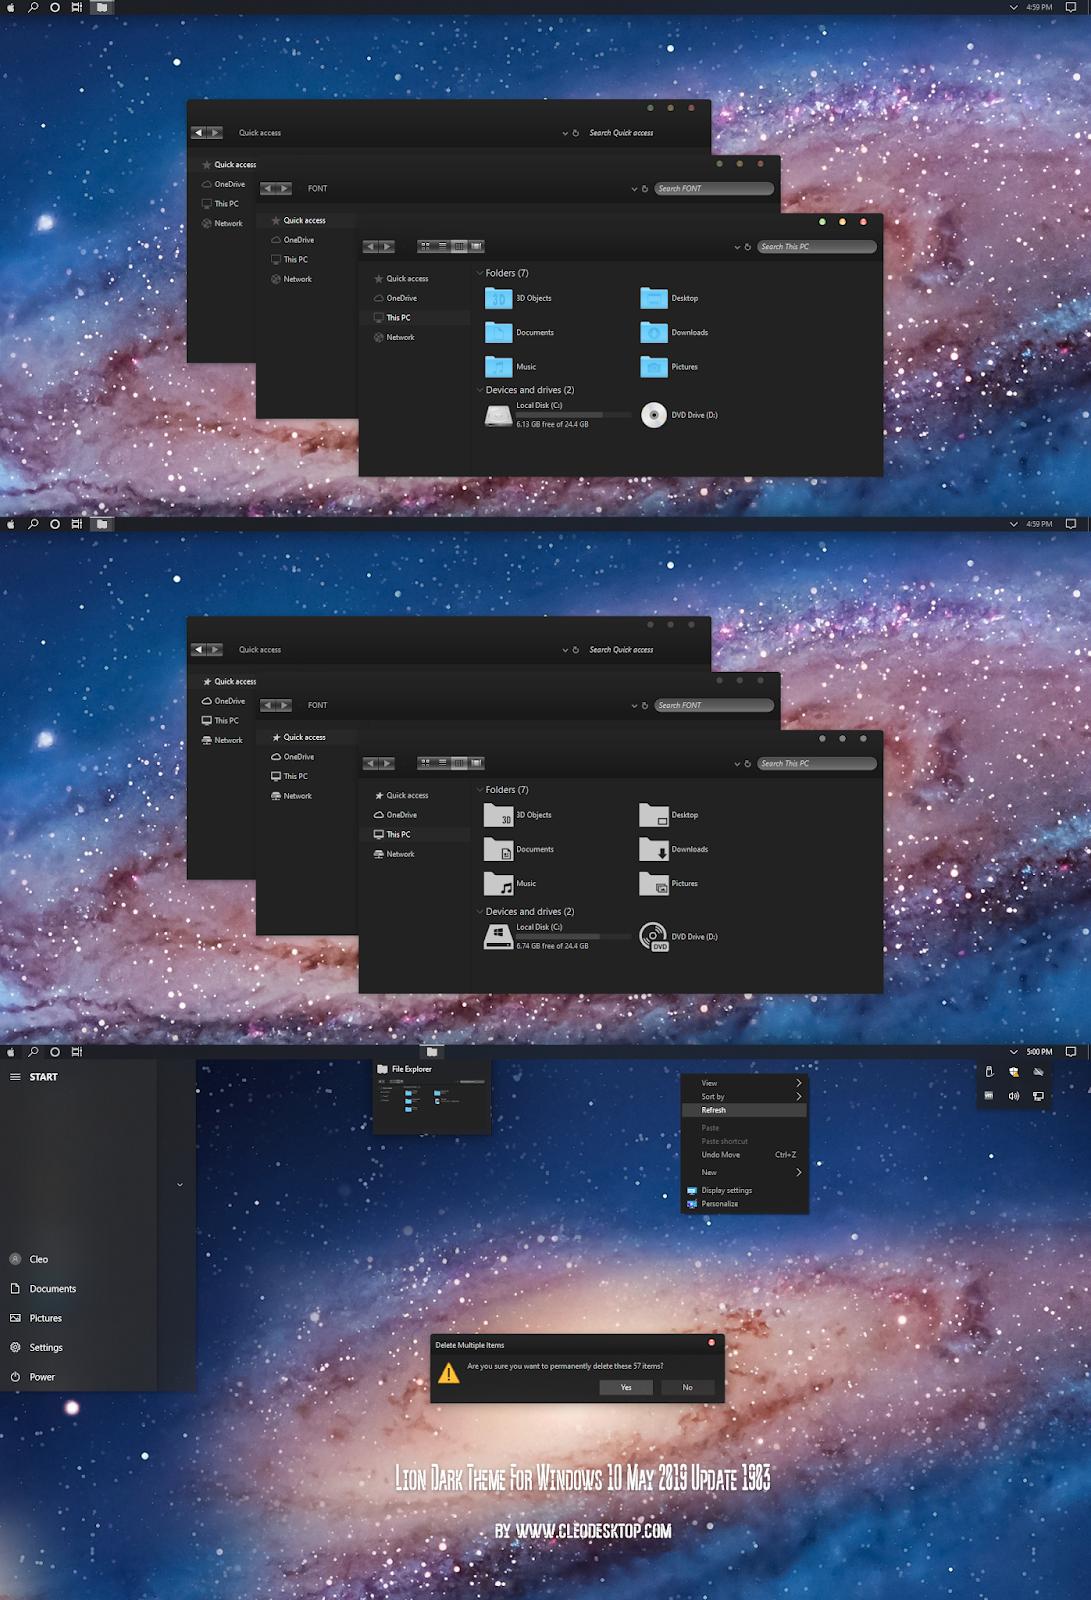 Lion Dark Theme For Windows10 May 2019 Update 1903